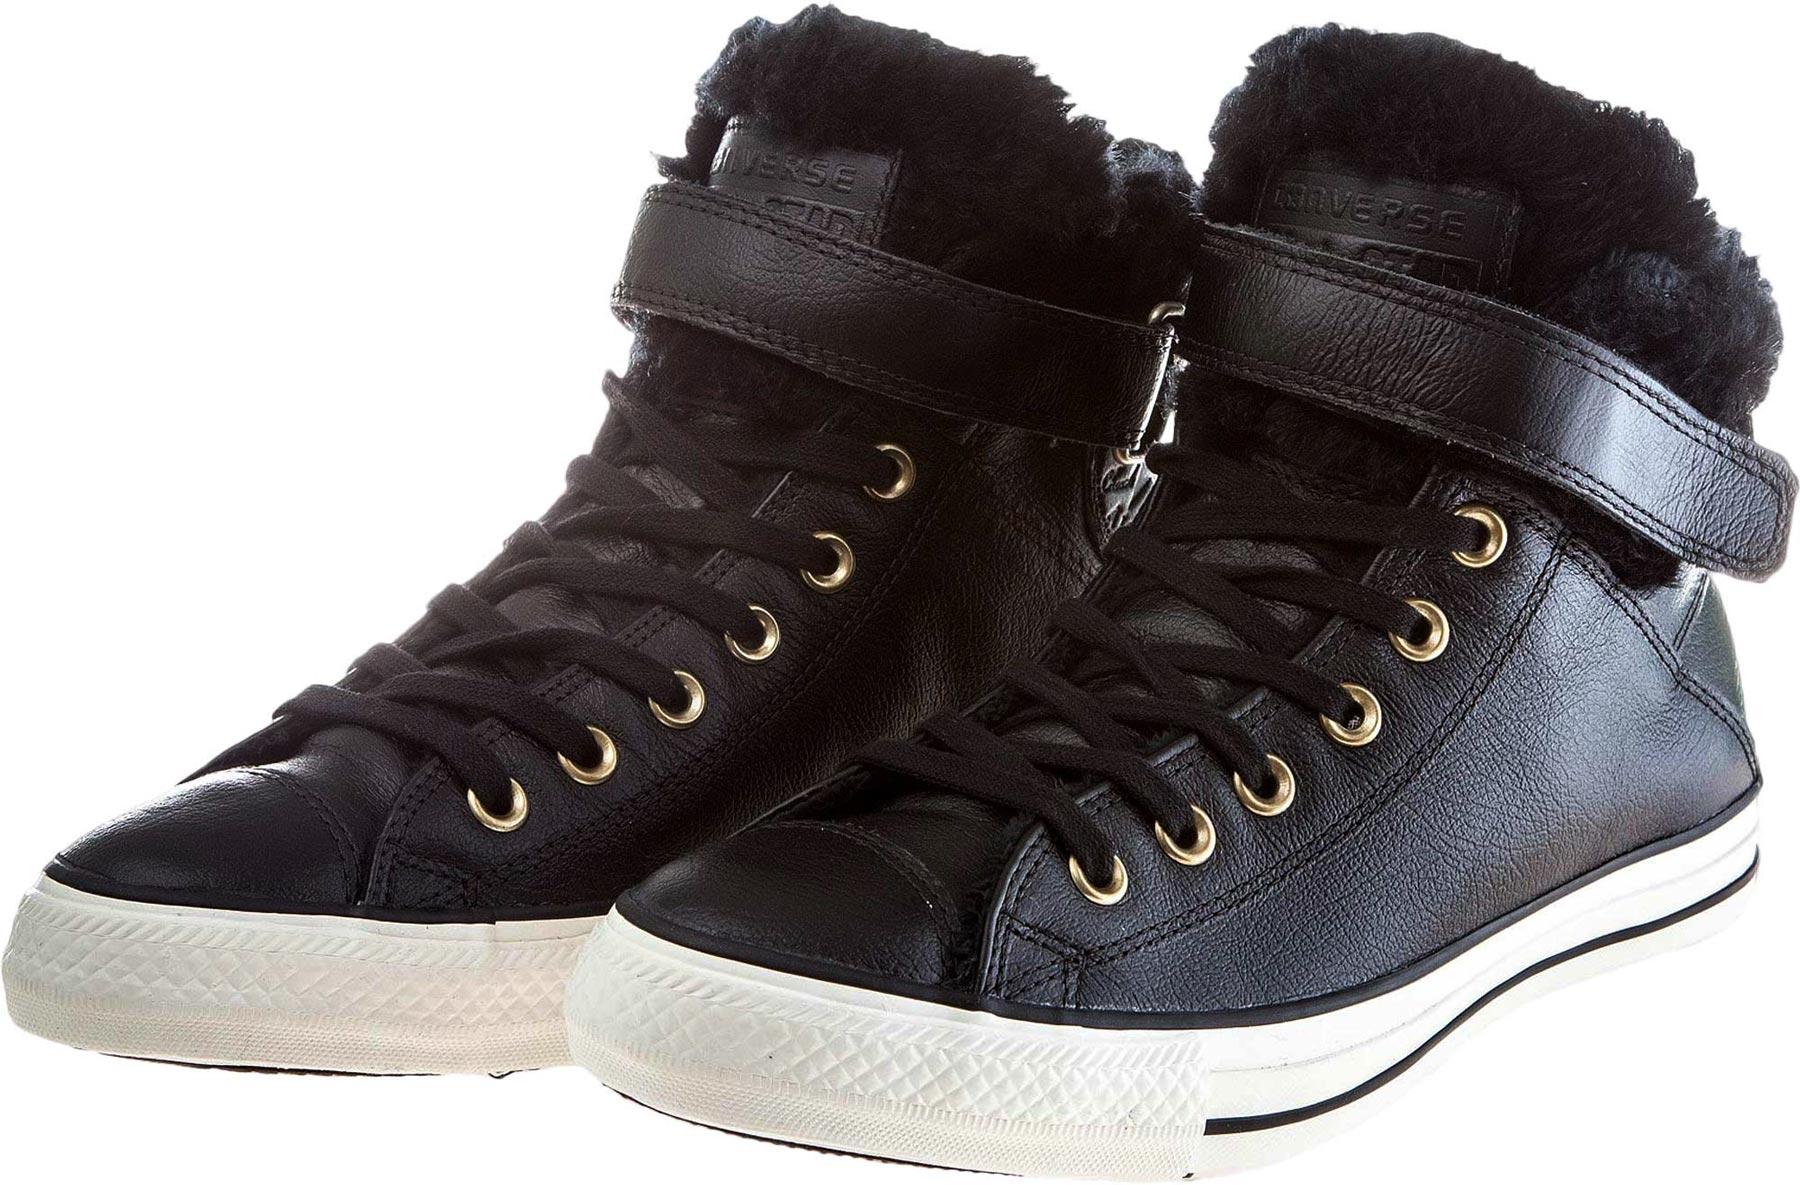 Converse CHUCK TAYLOR ALL STAR BREA HI LEATHER. Női téli tornacipő. Női  téli tornacipő e9c10fc289